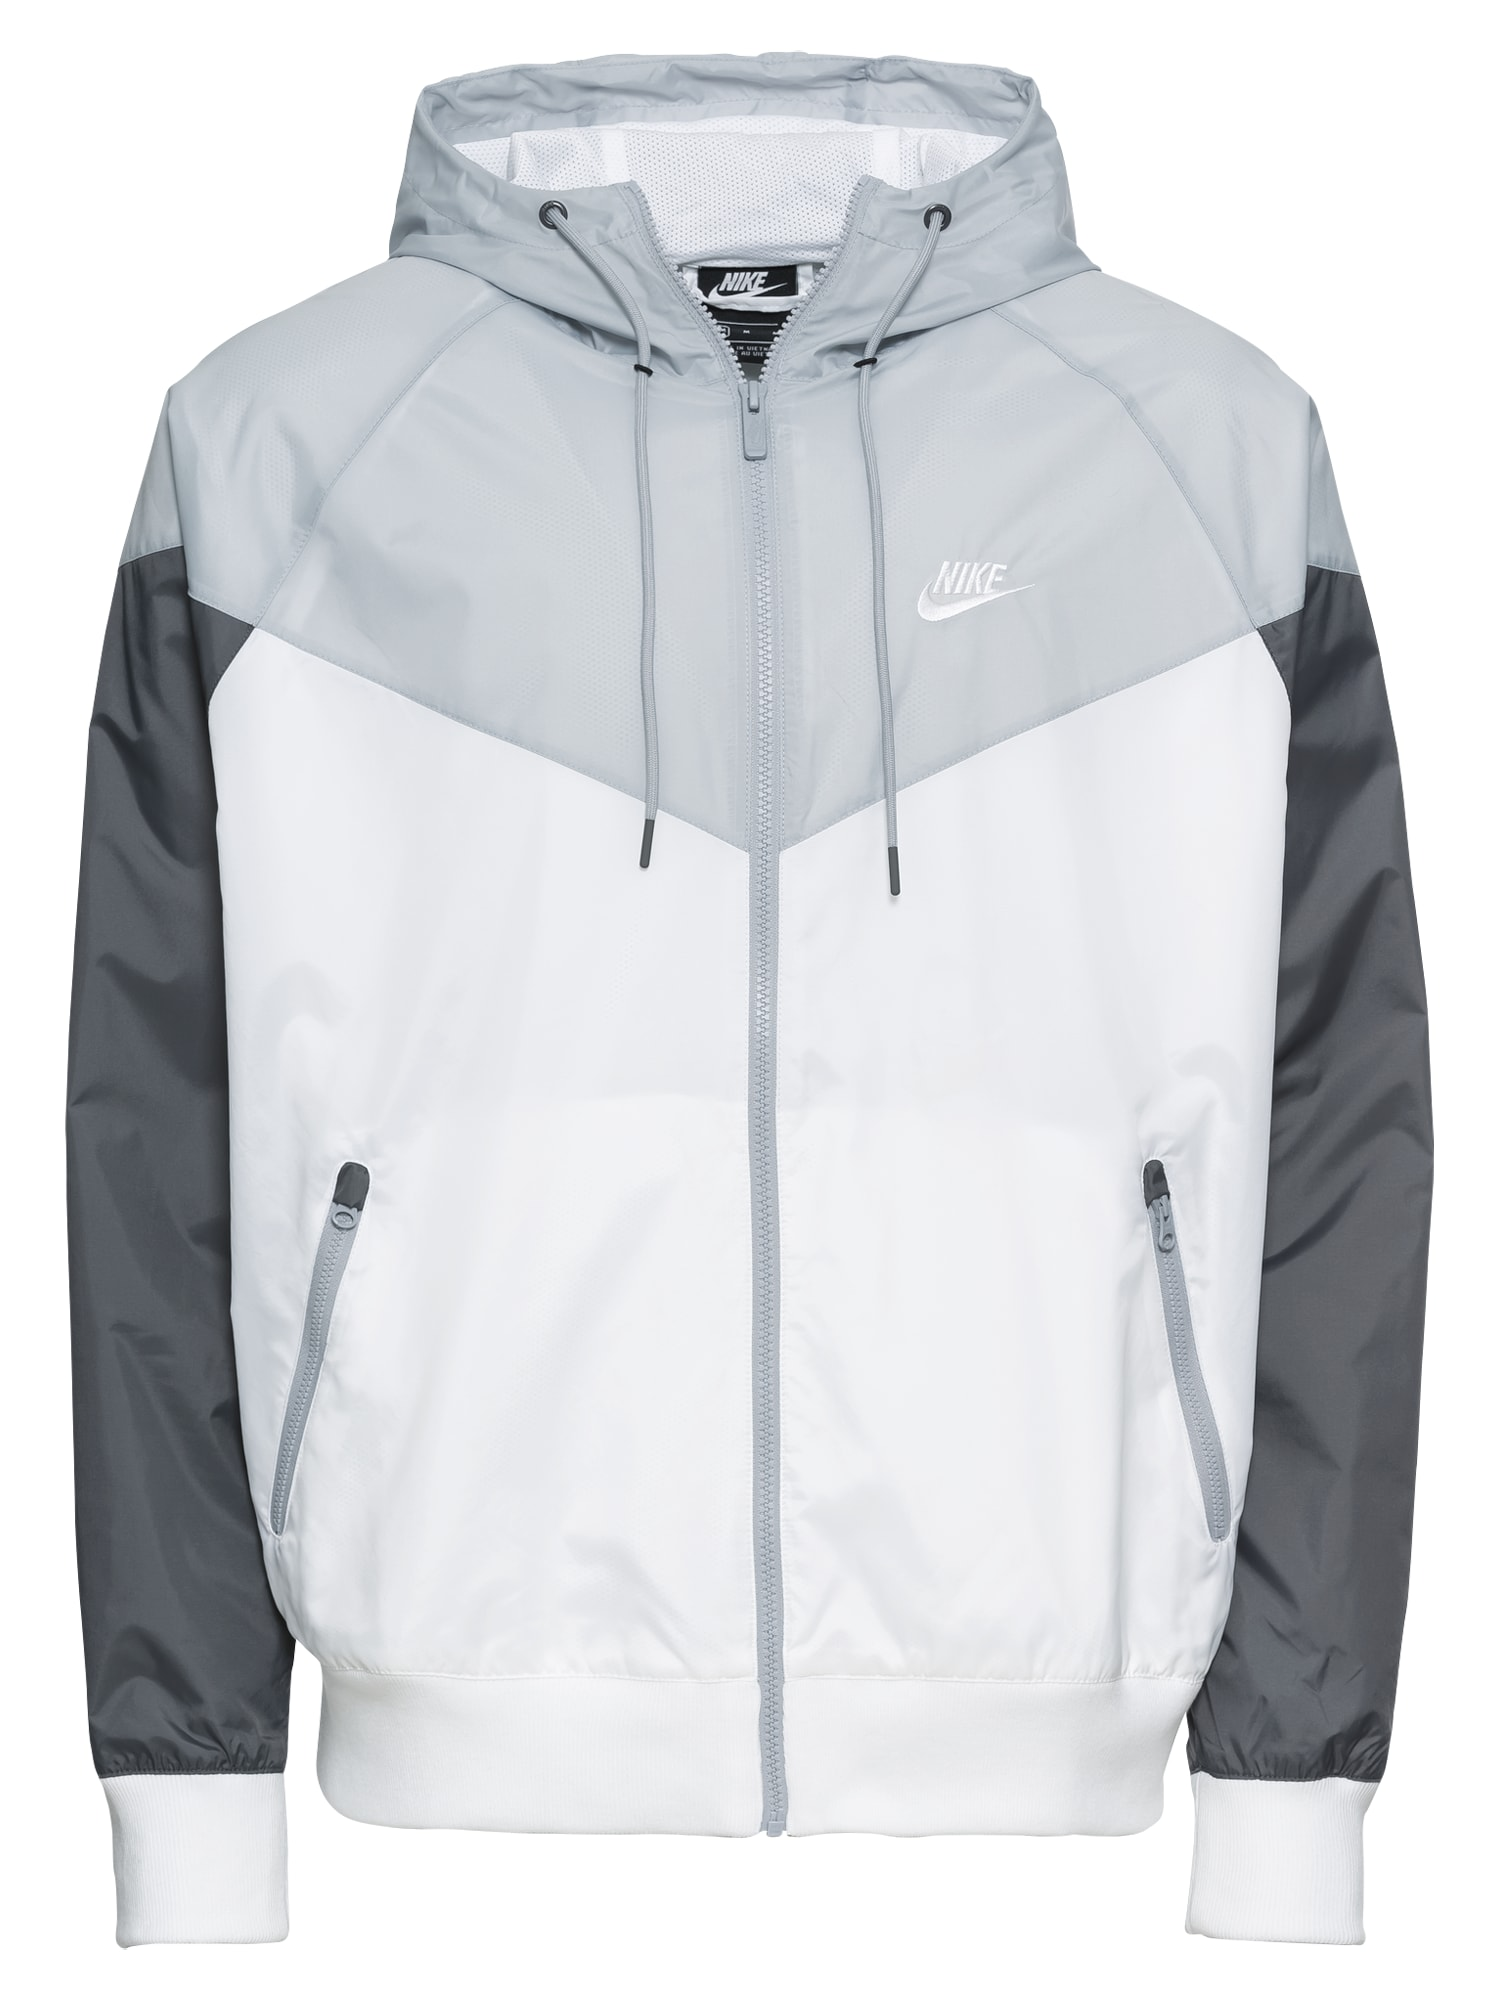 Nike Sportswear Demisezoninė striukė balta / pilka / tamsiai pilka